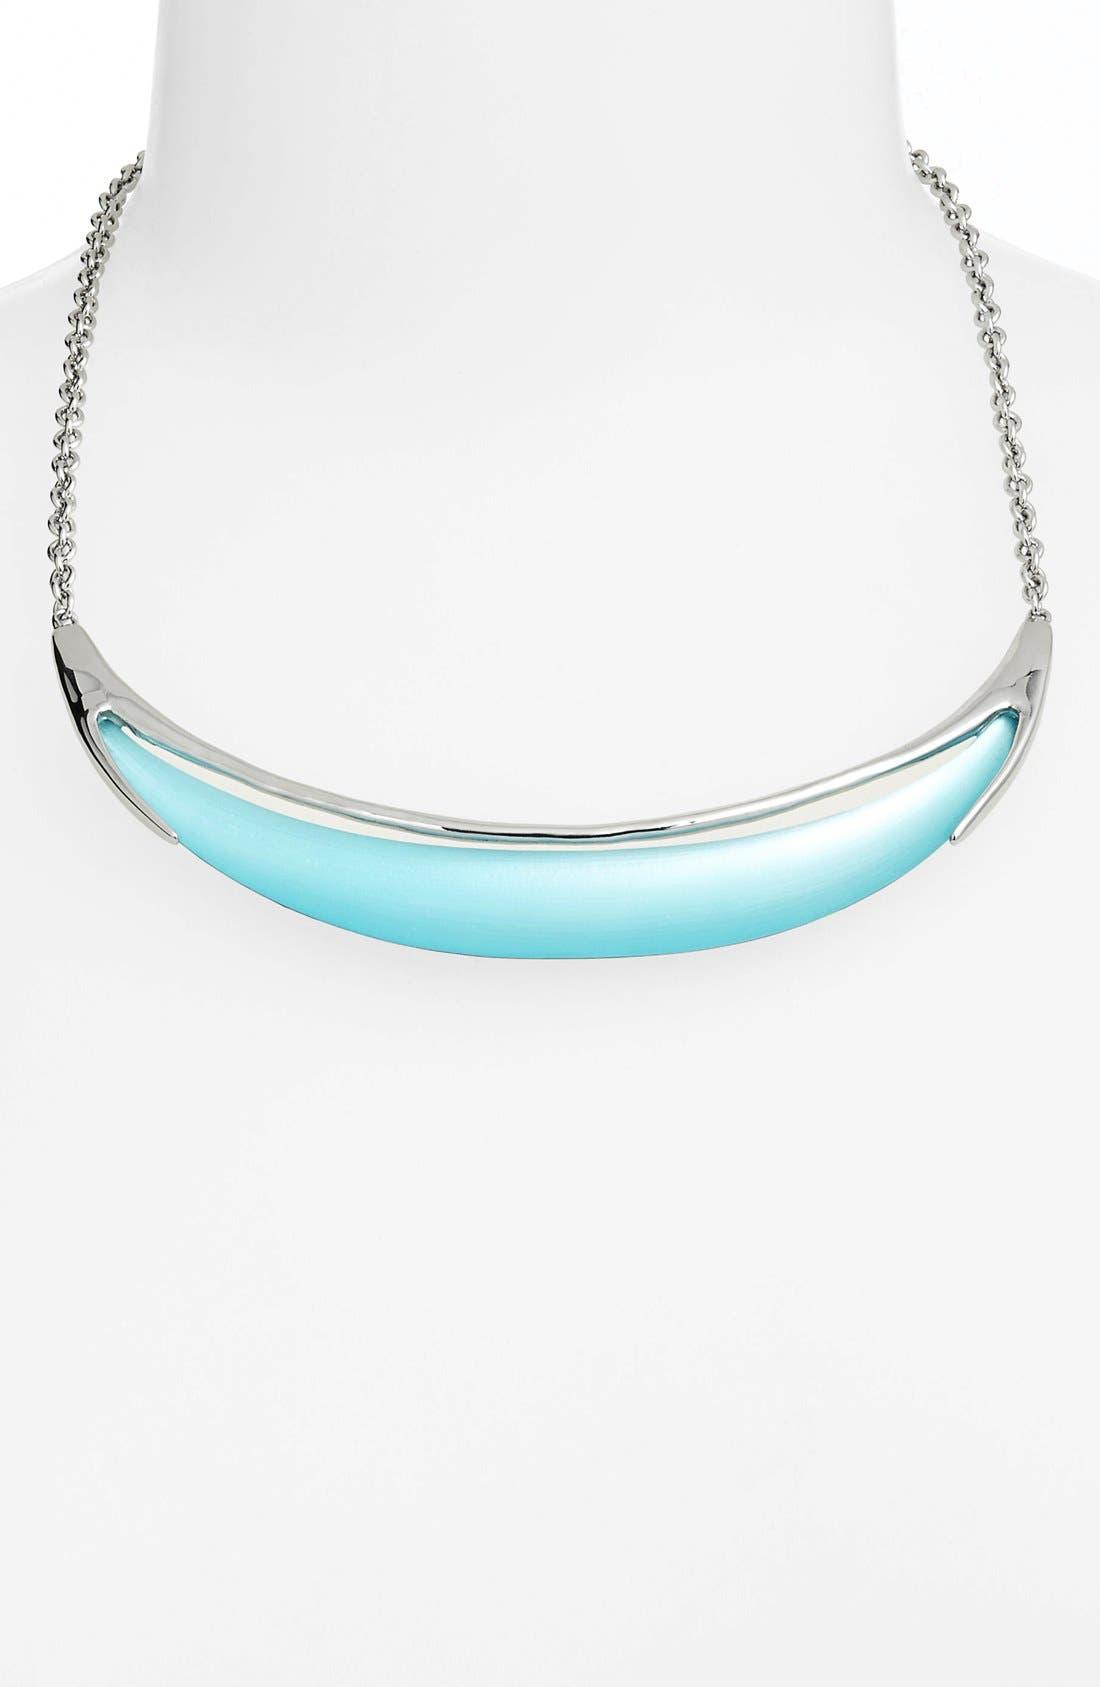 Main Image - Alexis Bittar 'Lucite® - Neon Deco' Crescent Necklace